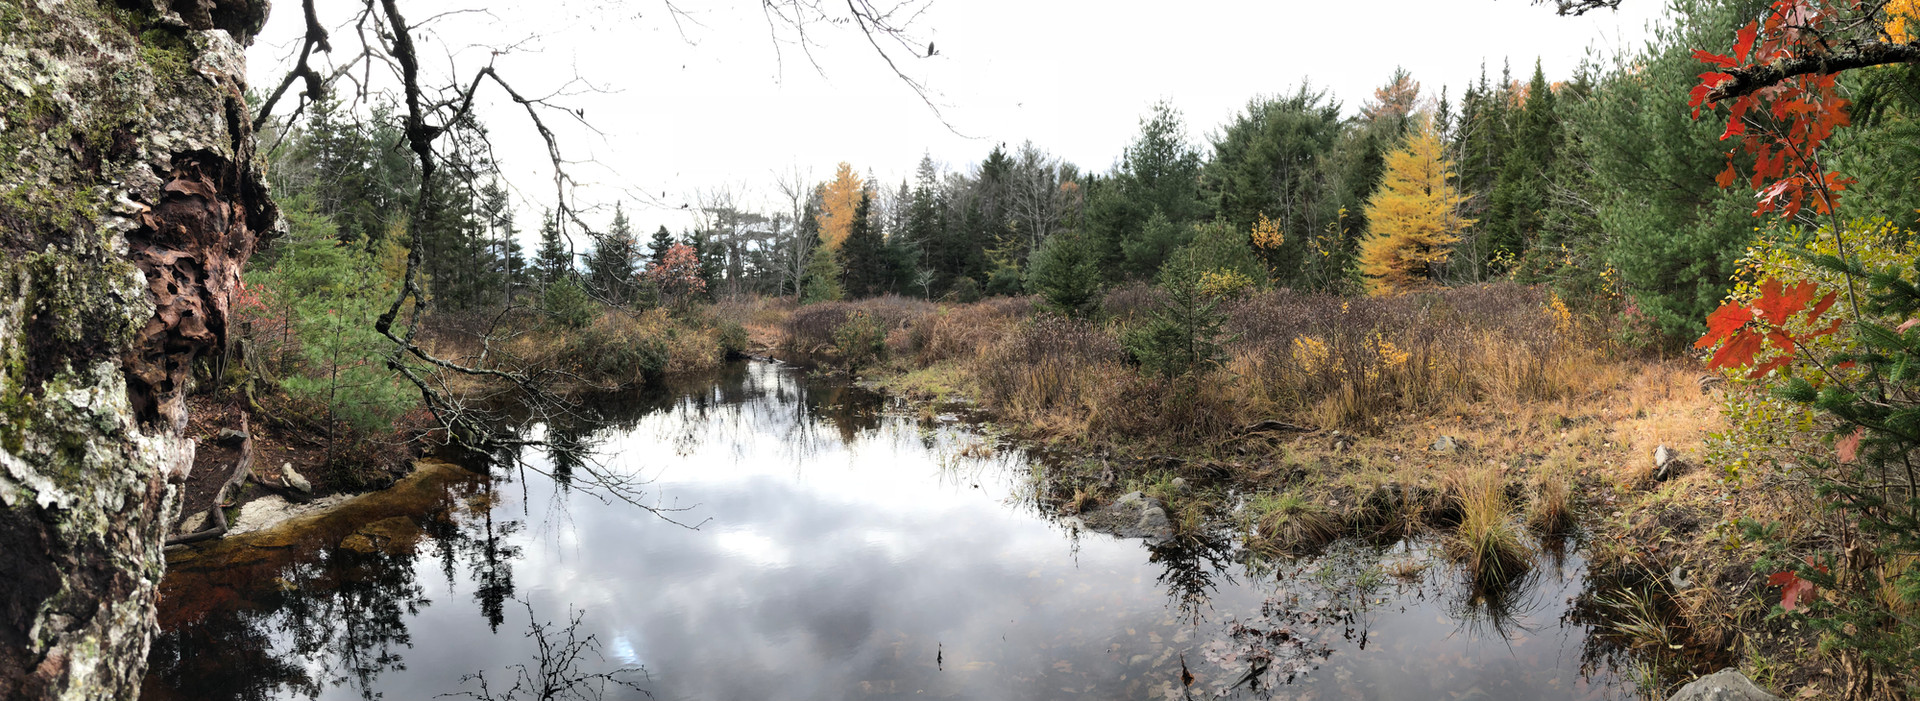 Richard Vinson, Hobson Lake Outlet